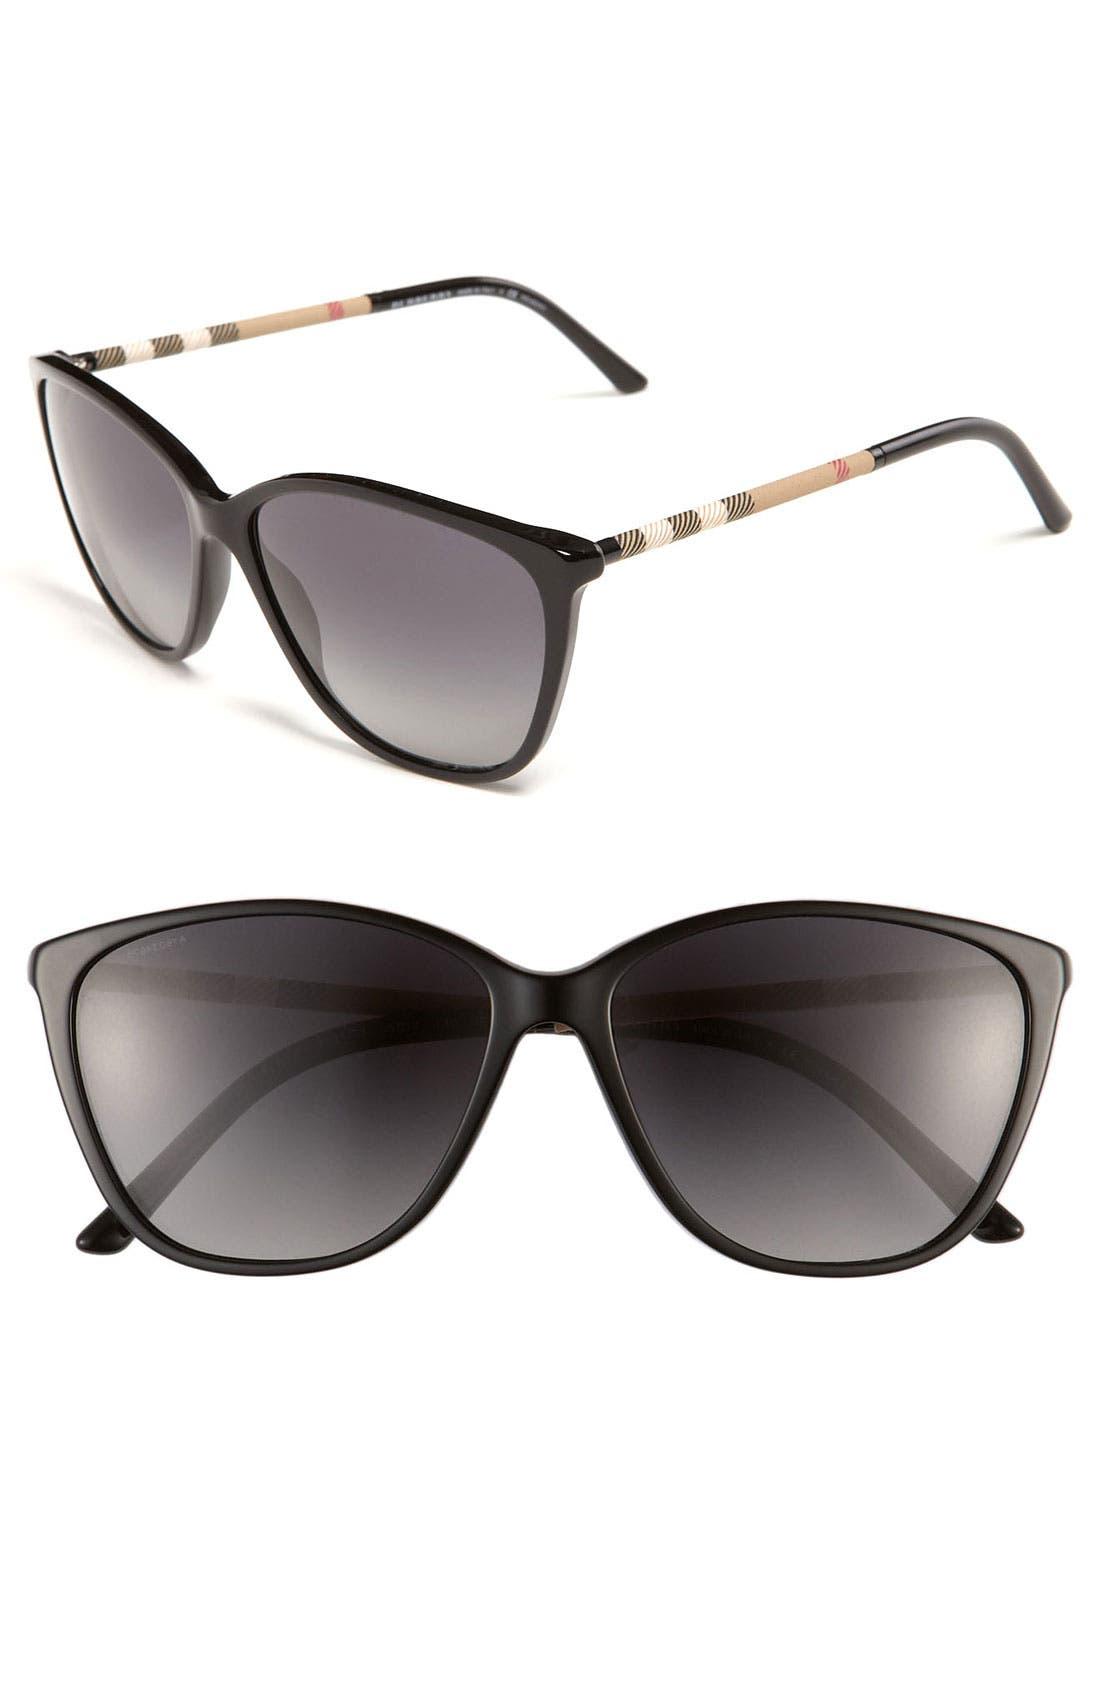 Main Image - Burberry Retro 58mm Polarized Sunglasses